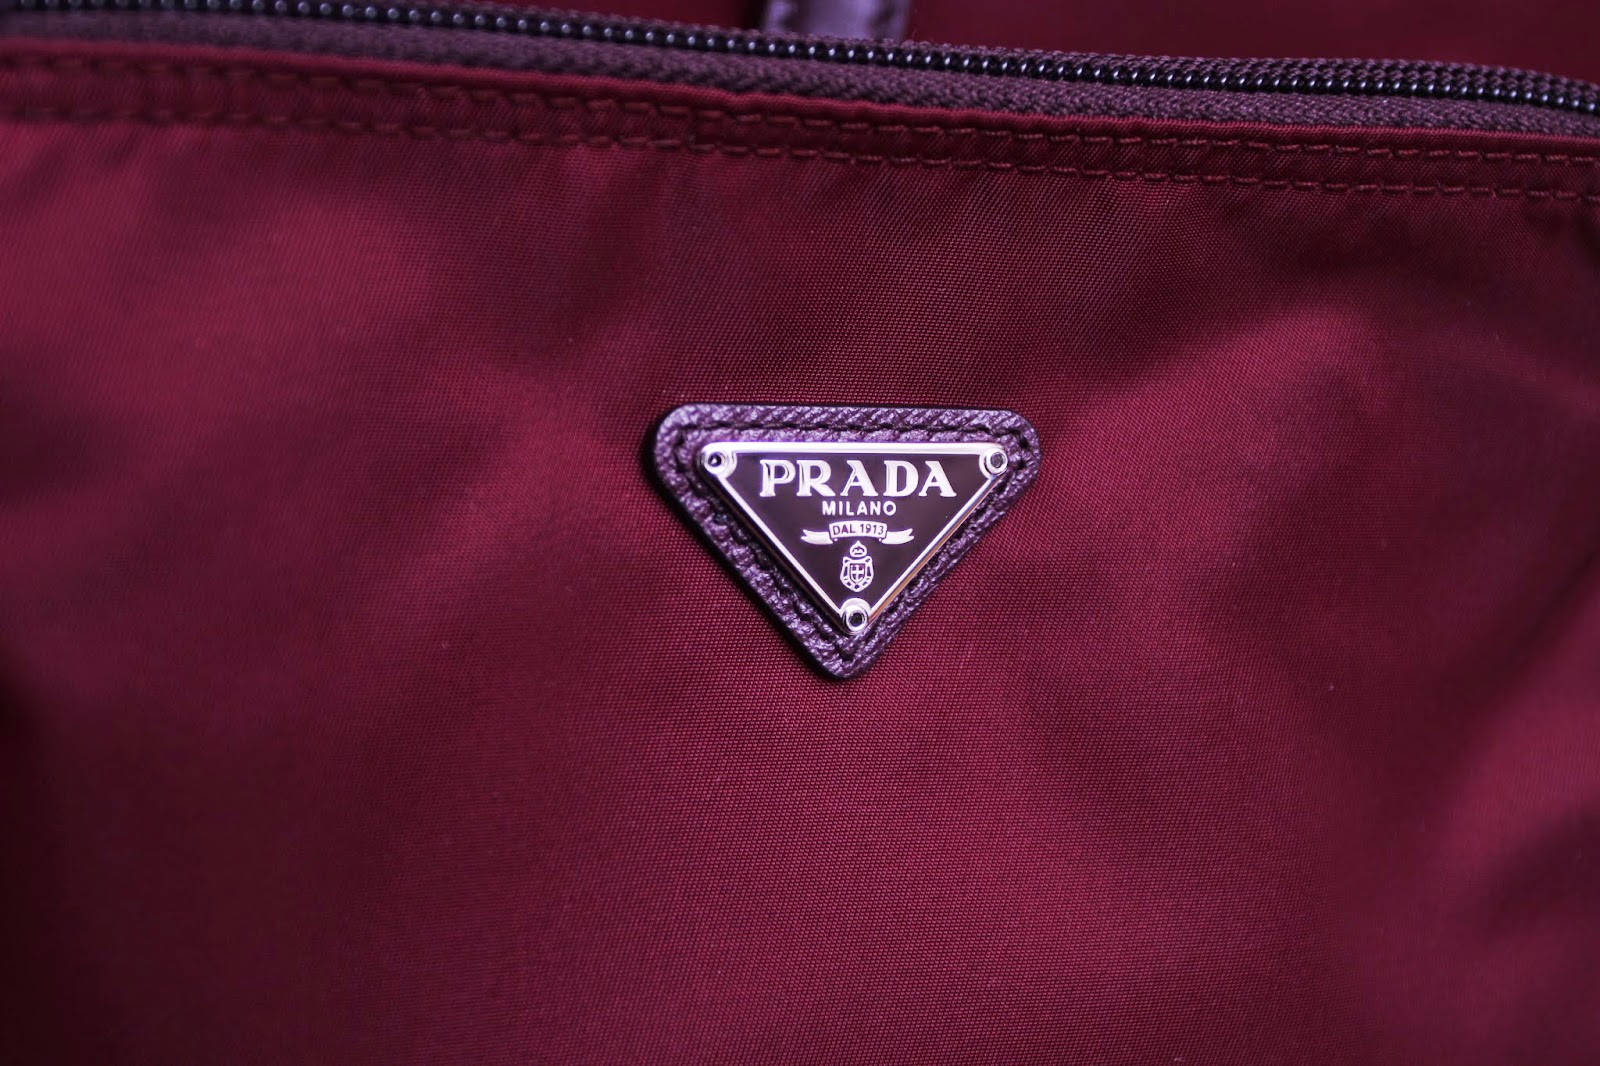 Prada Extra Sale Items (In Stock)